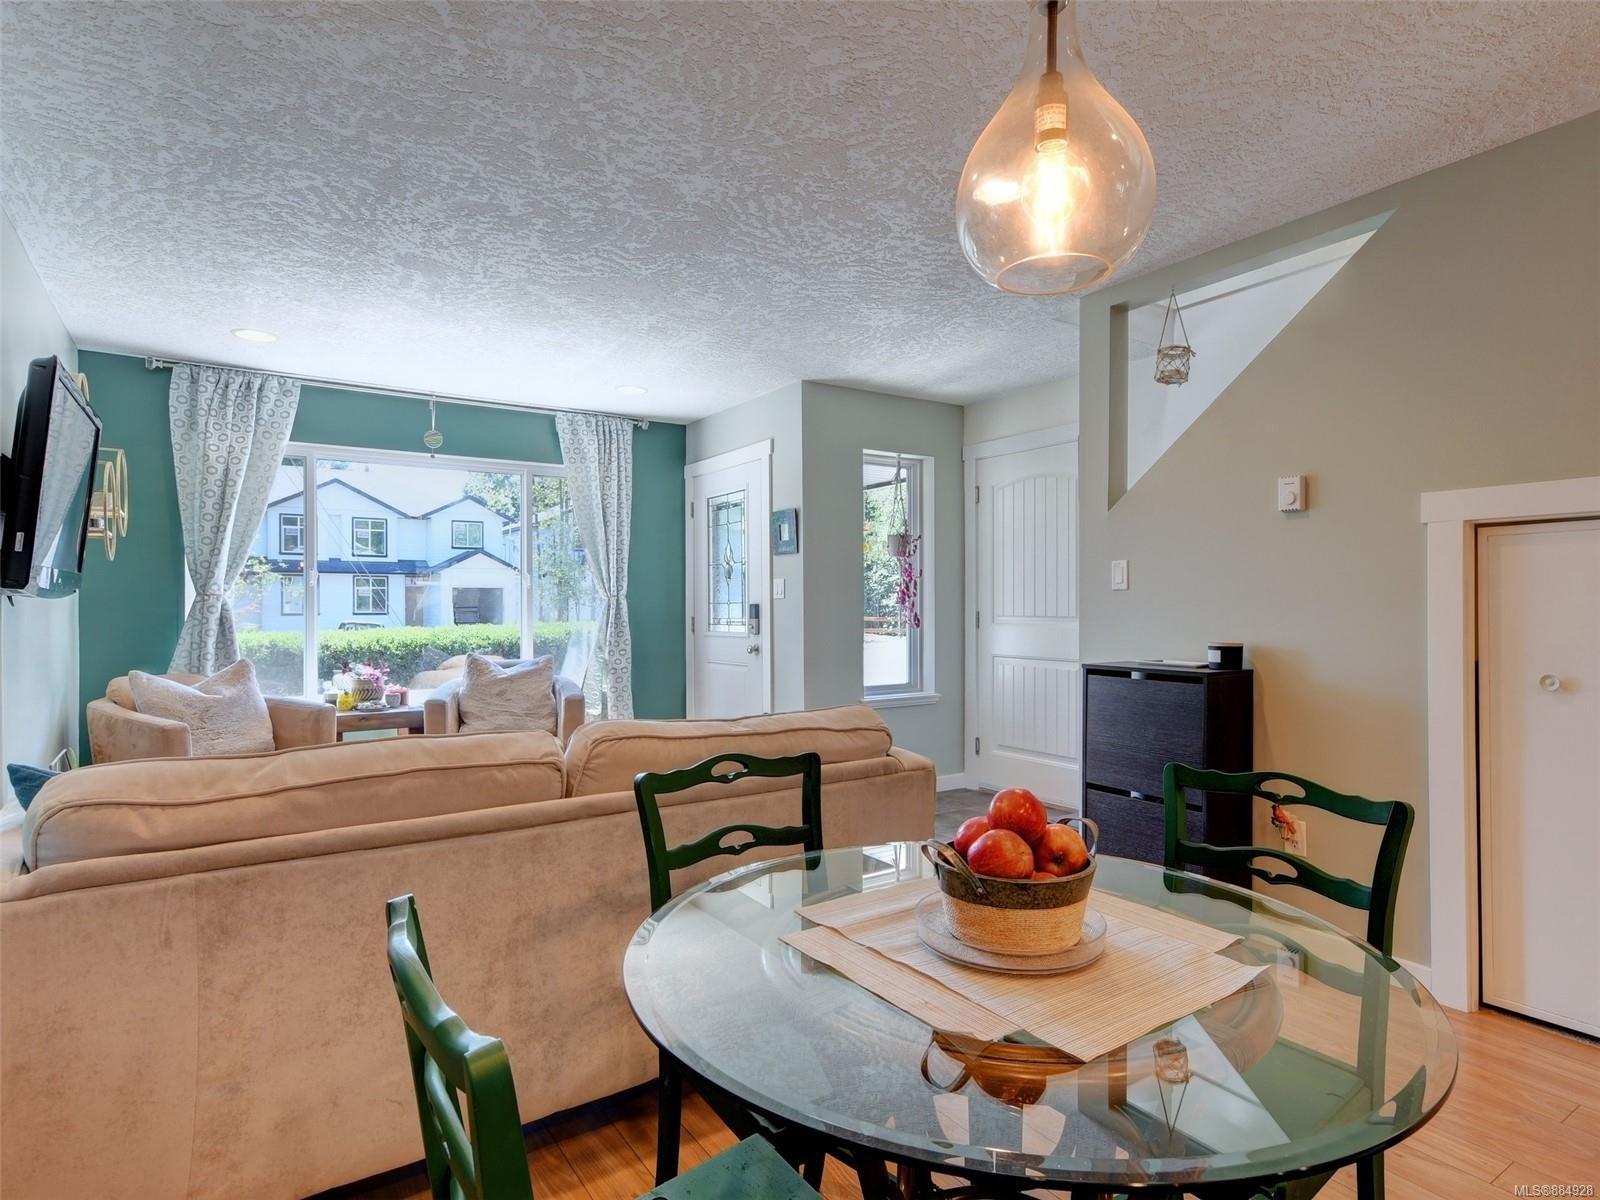 Photo 8: Photos: 6896 Beaton Rd in : Sk Broomhill Half Duplex for sale (Sooke)  : MLS®# 884928